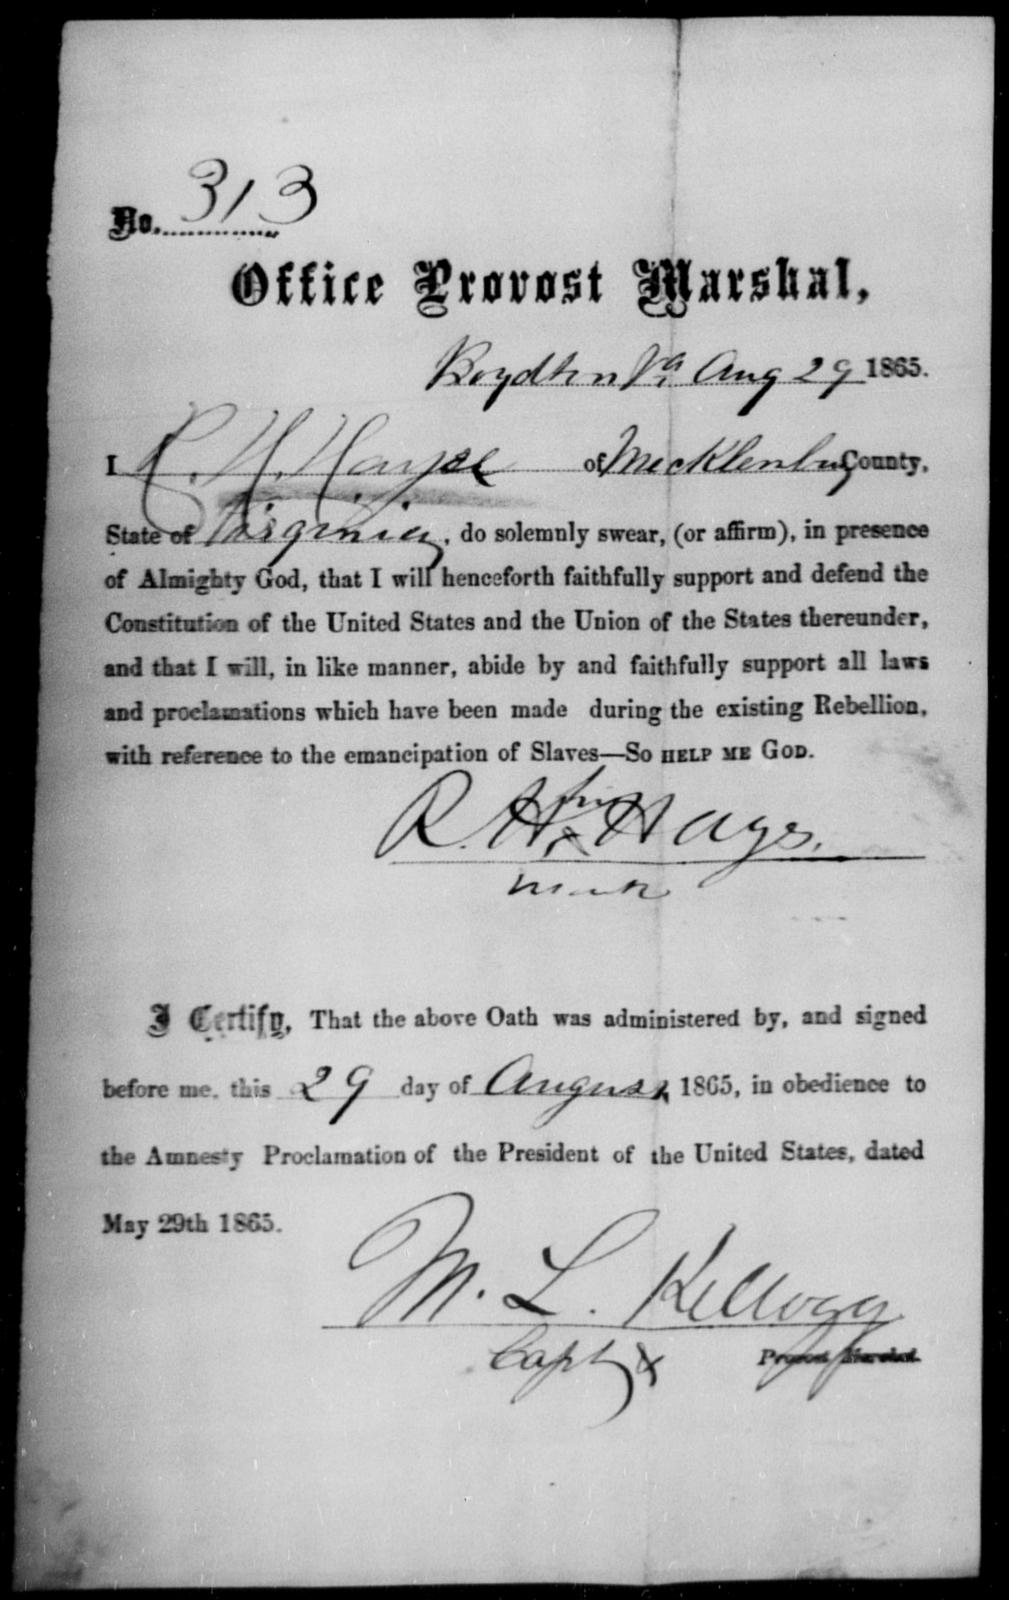 Hays, R H - State: Virginia - Year: 1865